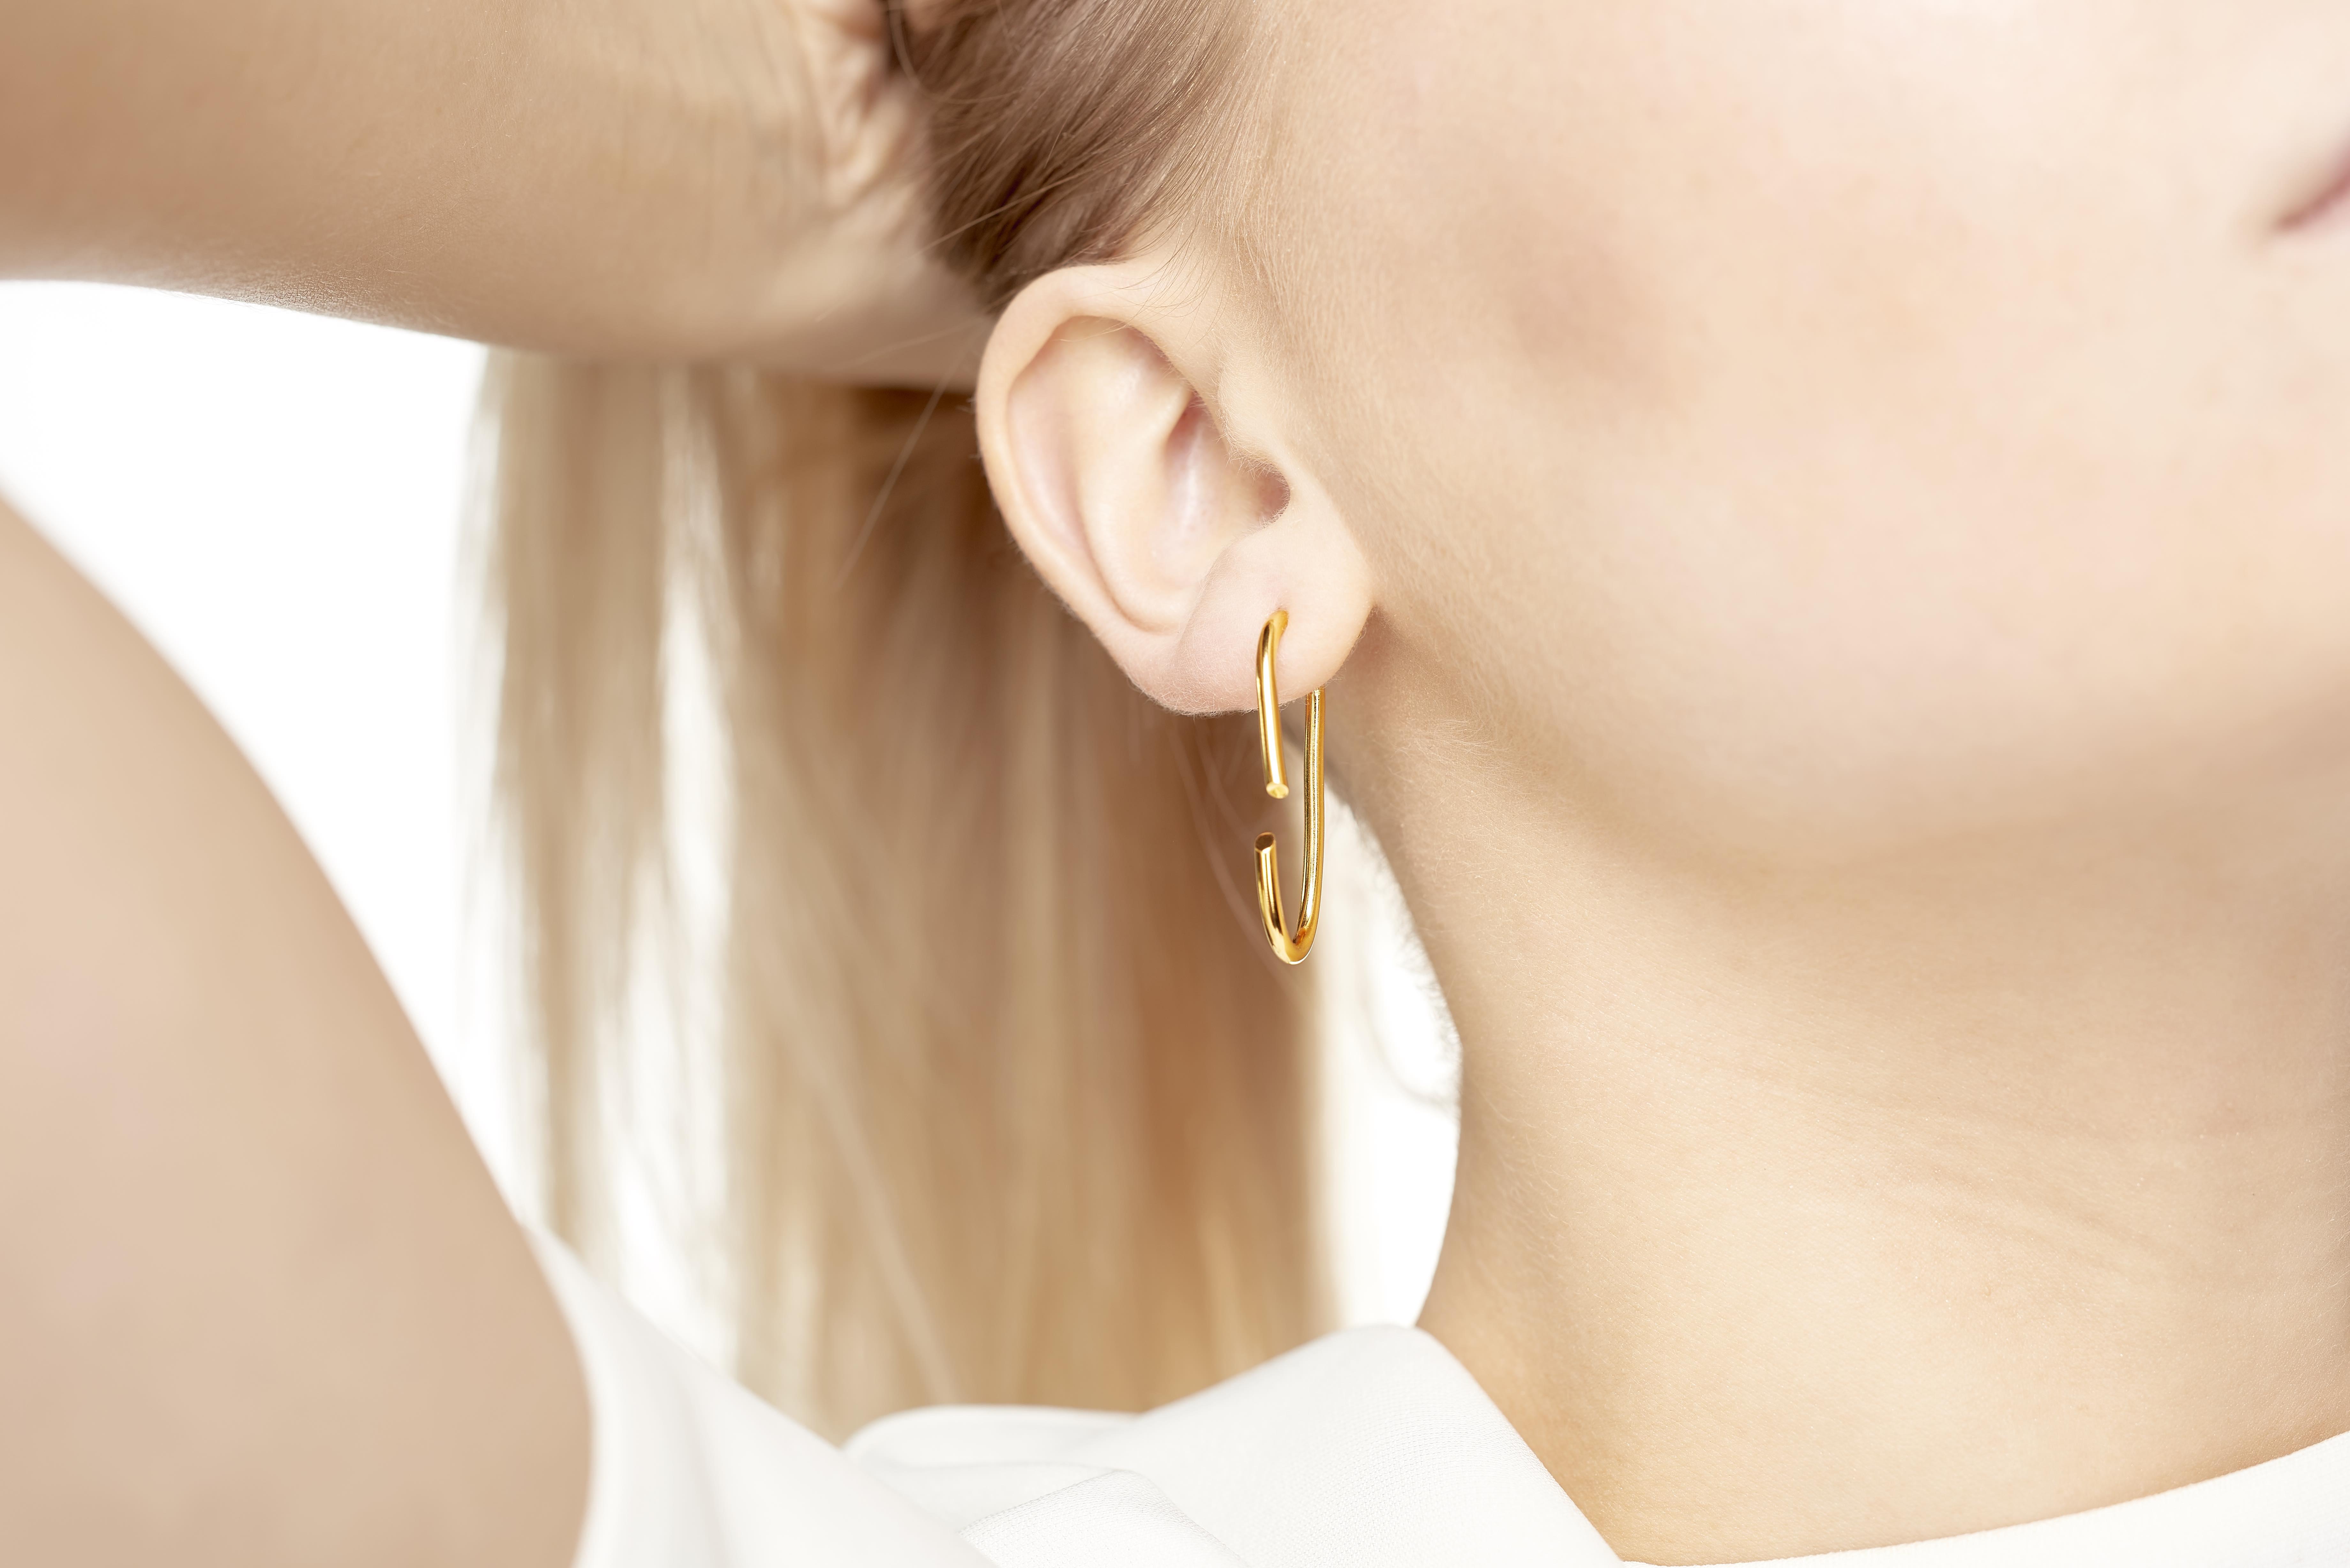 tubularmindsearstudtap&earjacketgold3